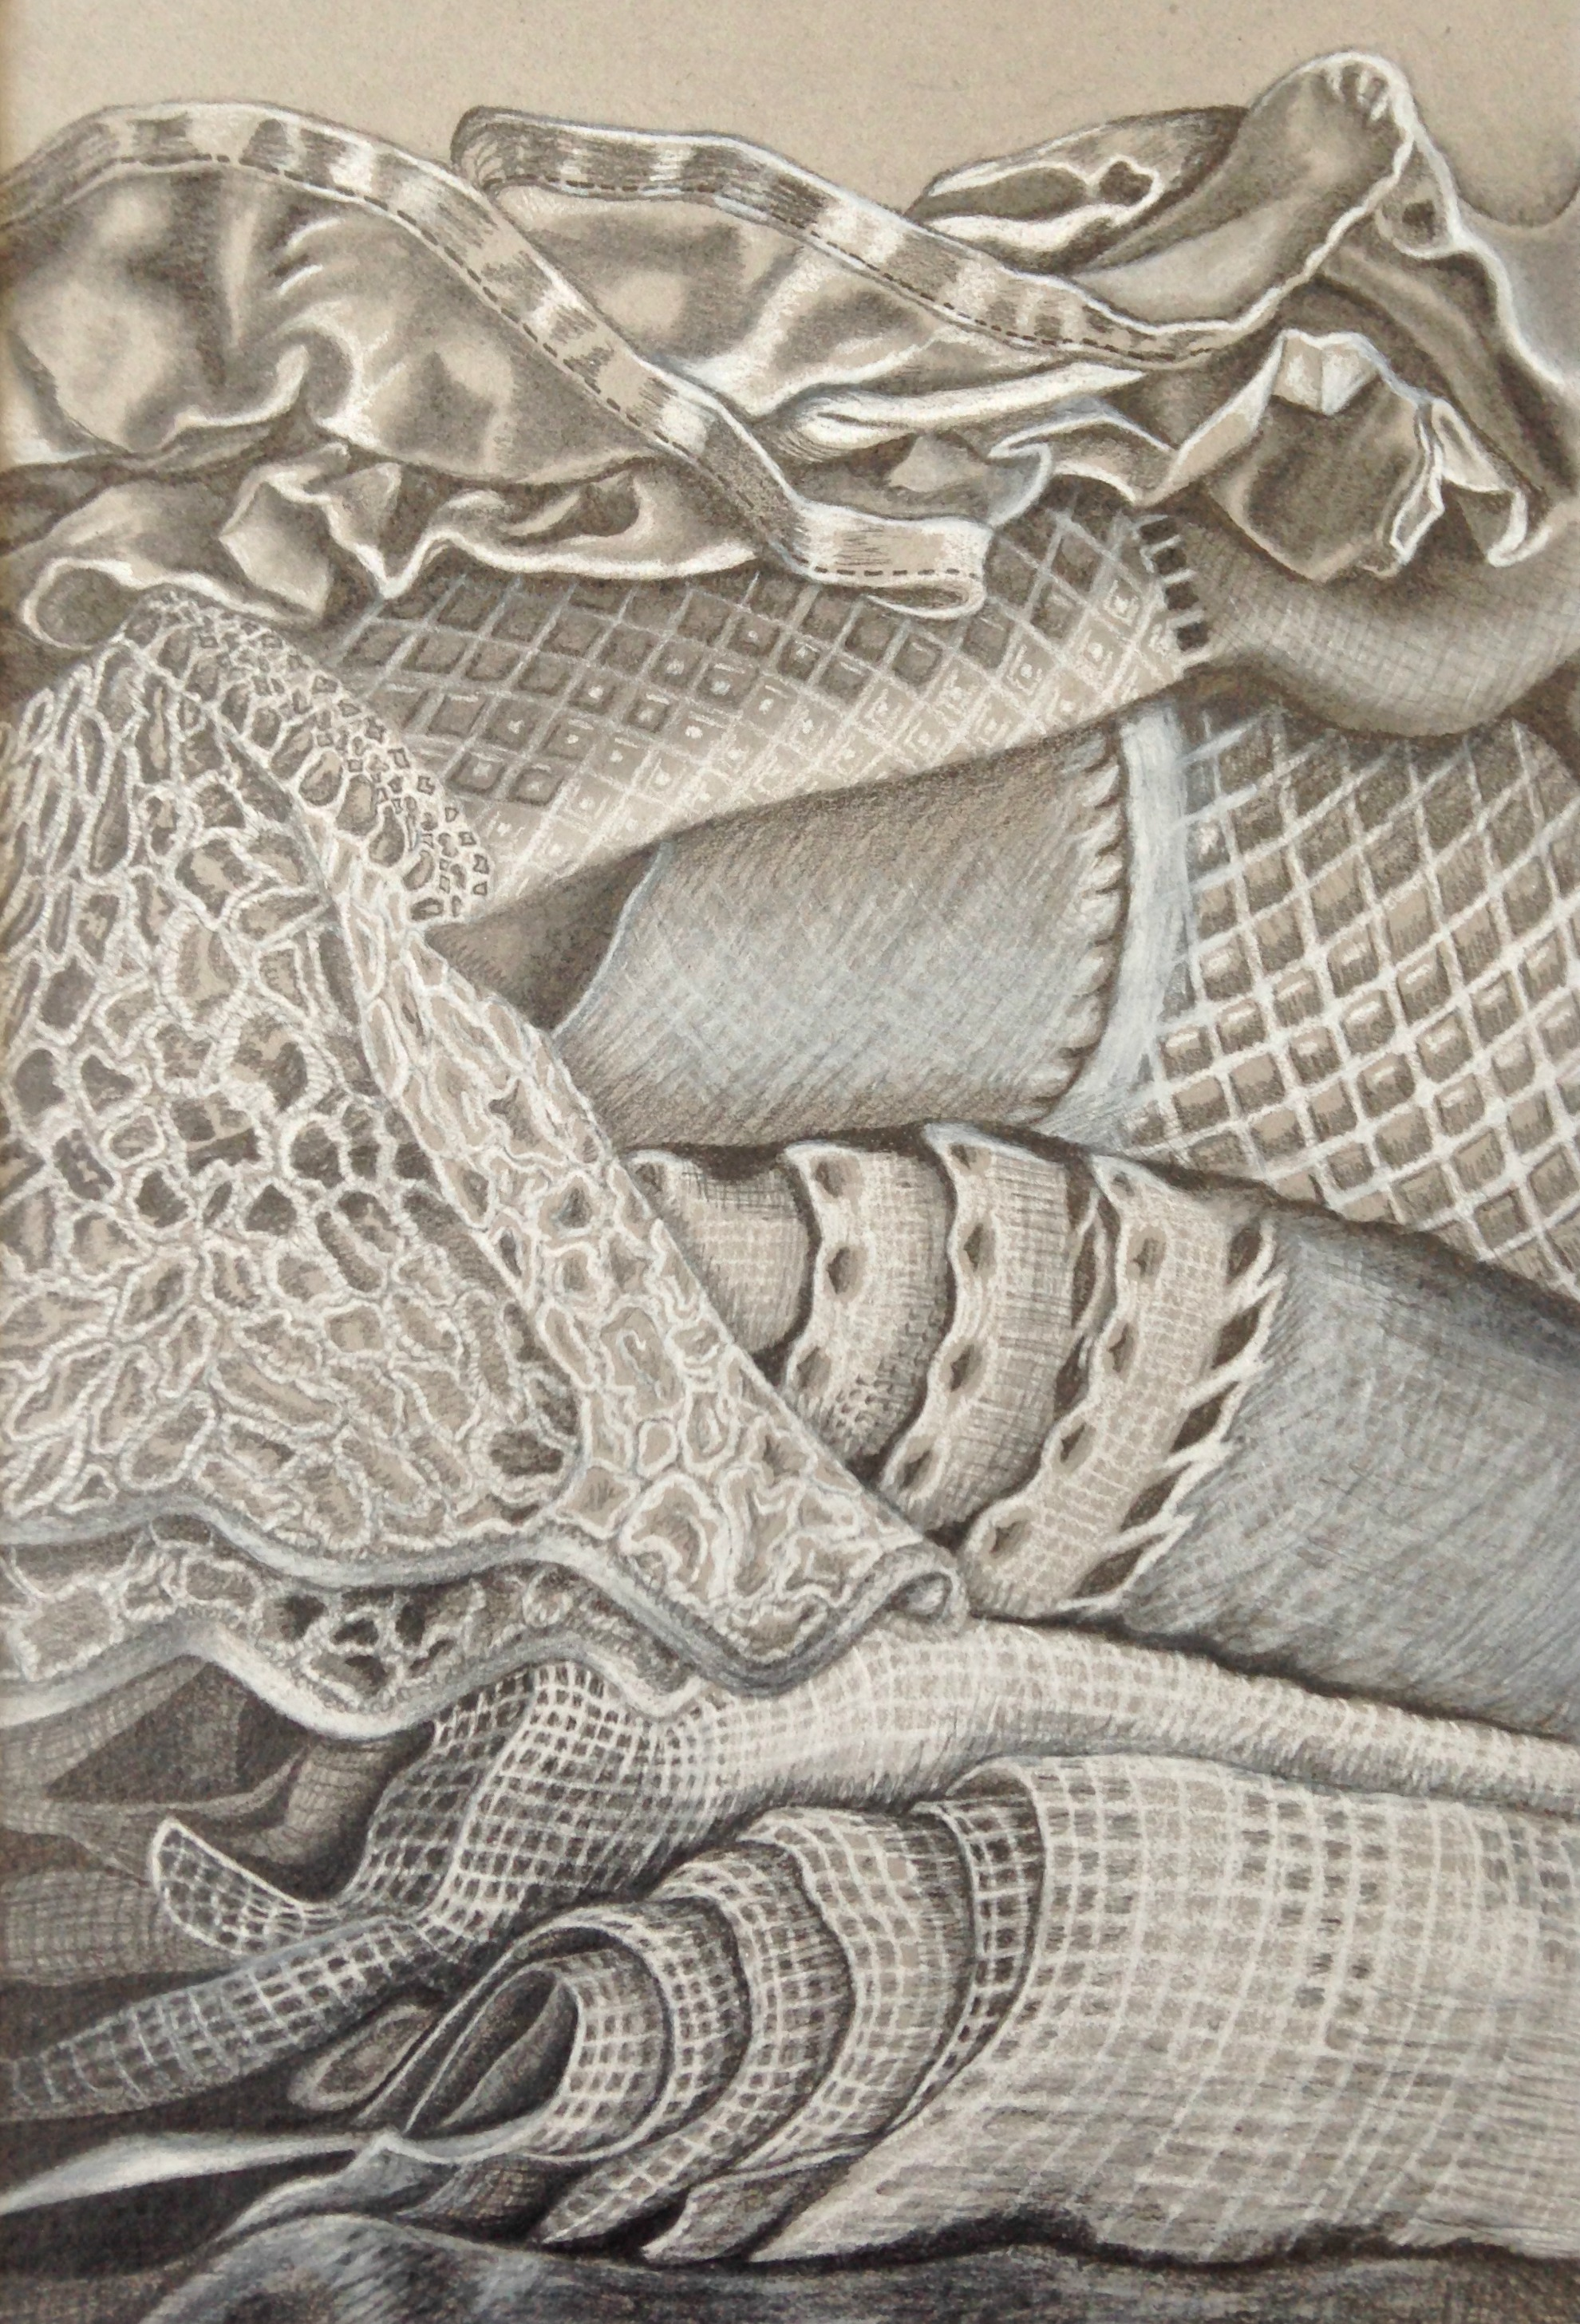 Fabric Pile.jpg